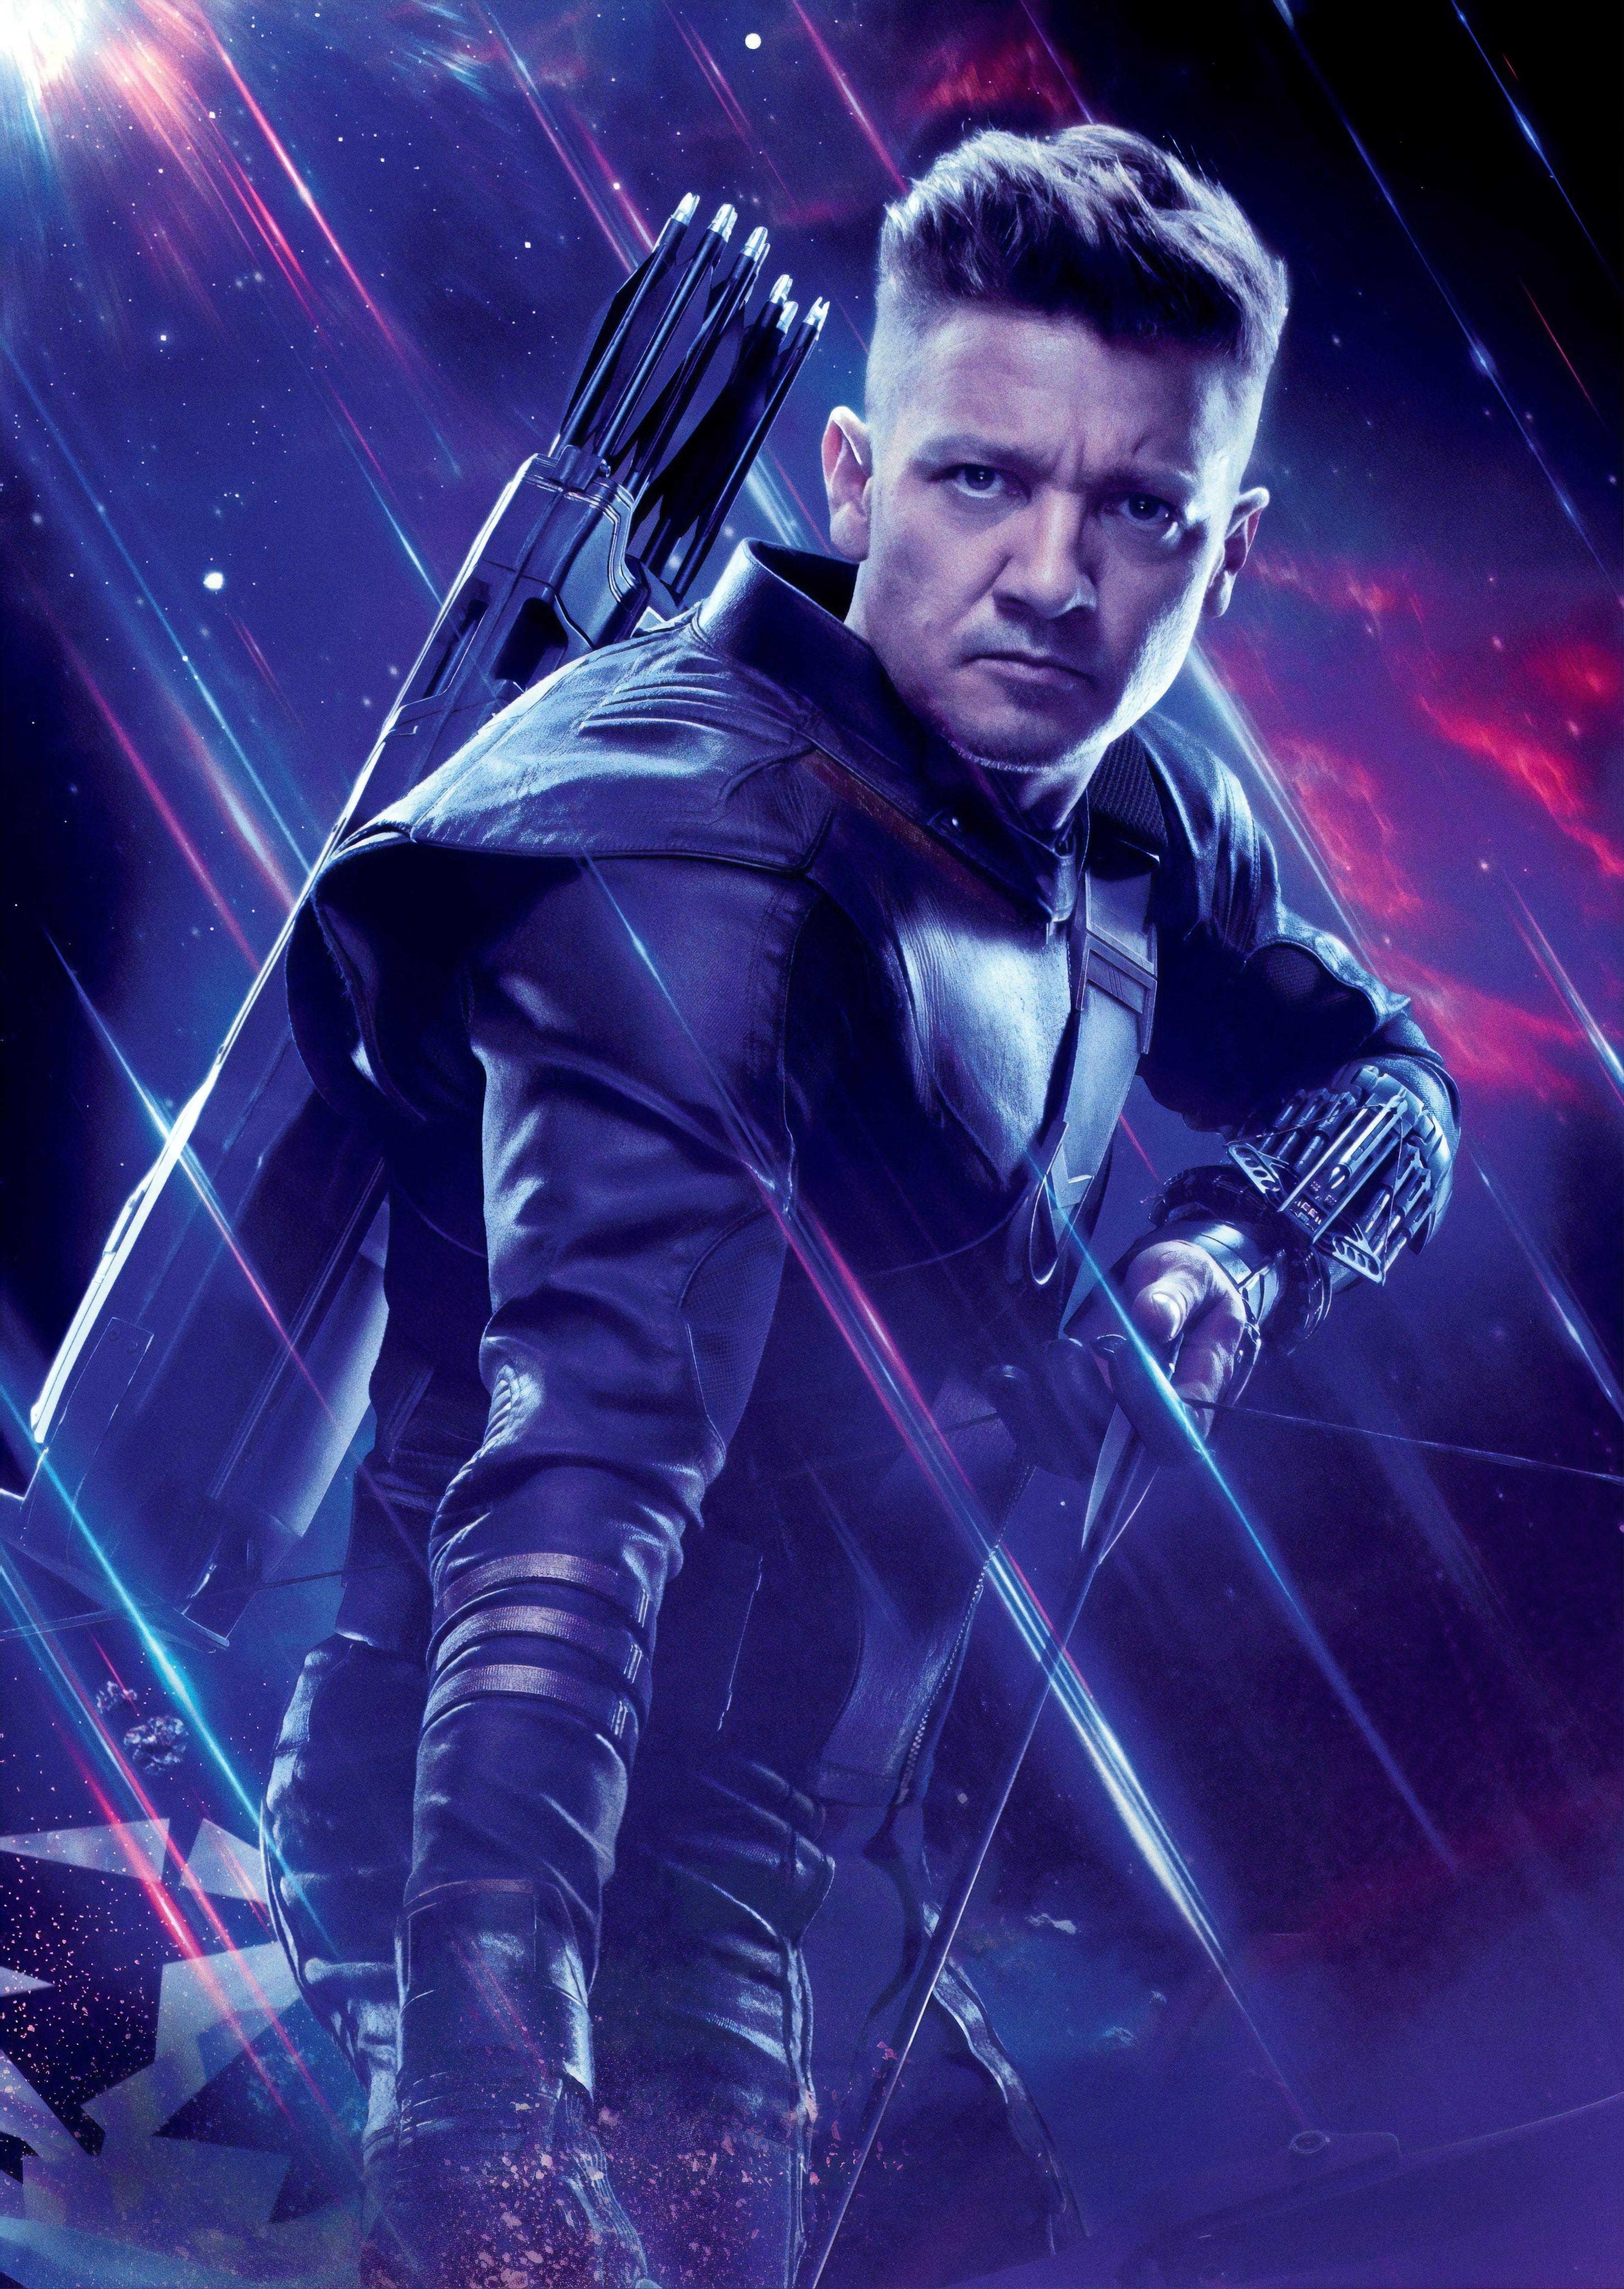 Hawkeye in Avengers Endgame Wallpaper HD Movies 4K Wallpapers 3547x5000